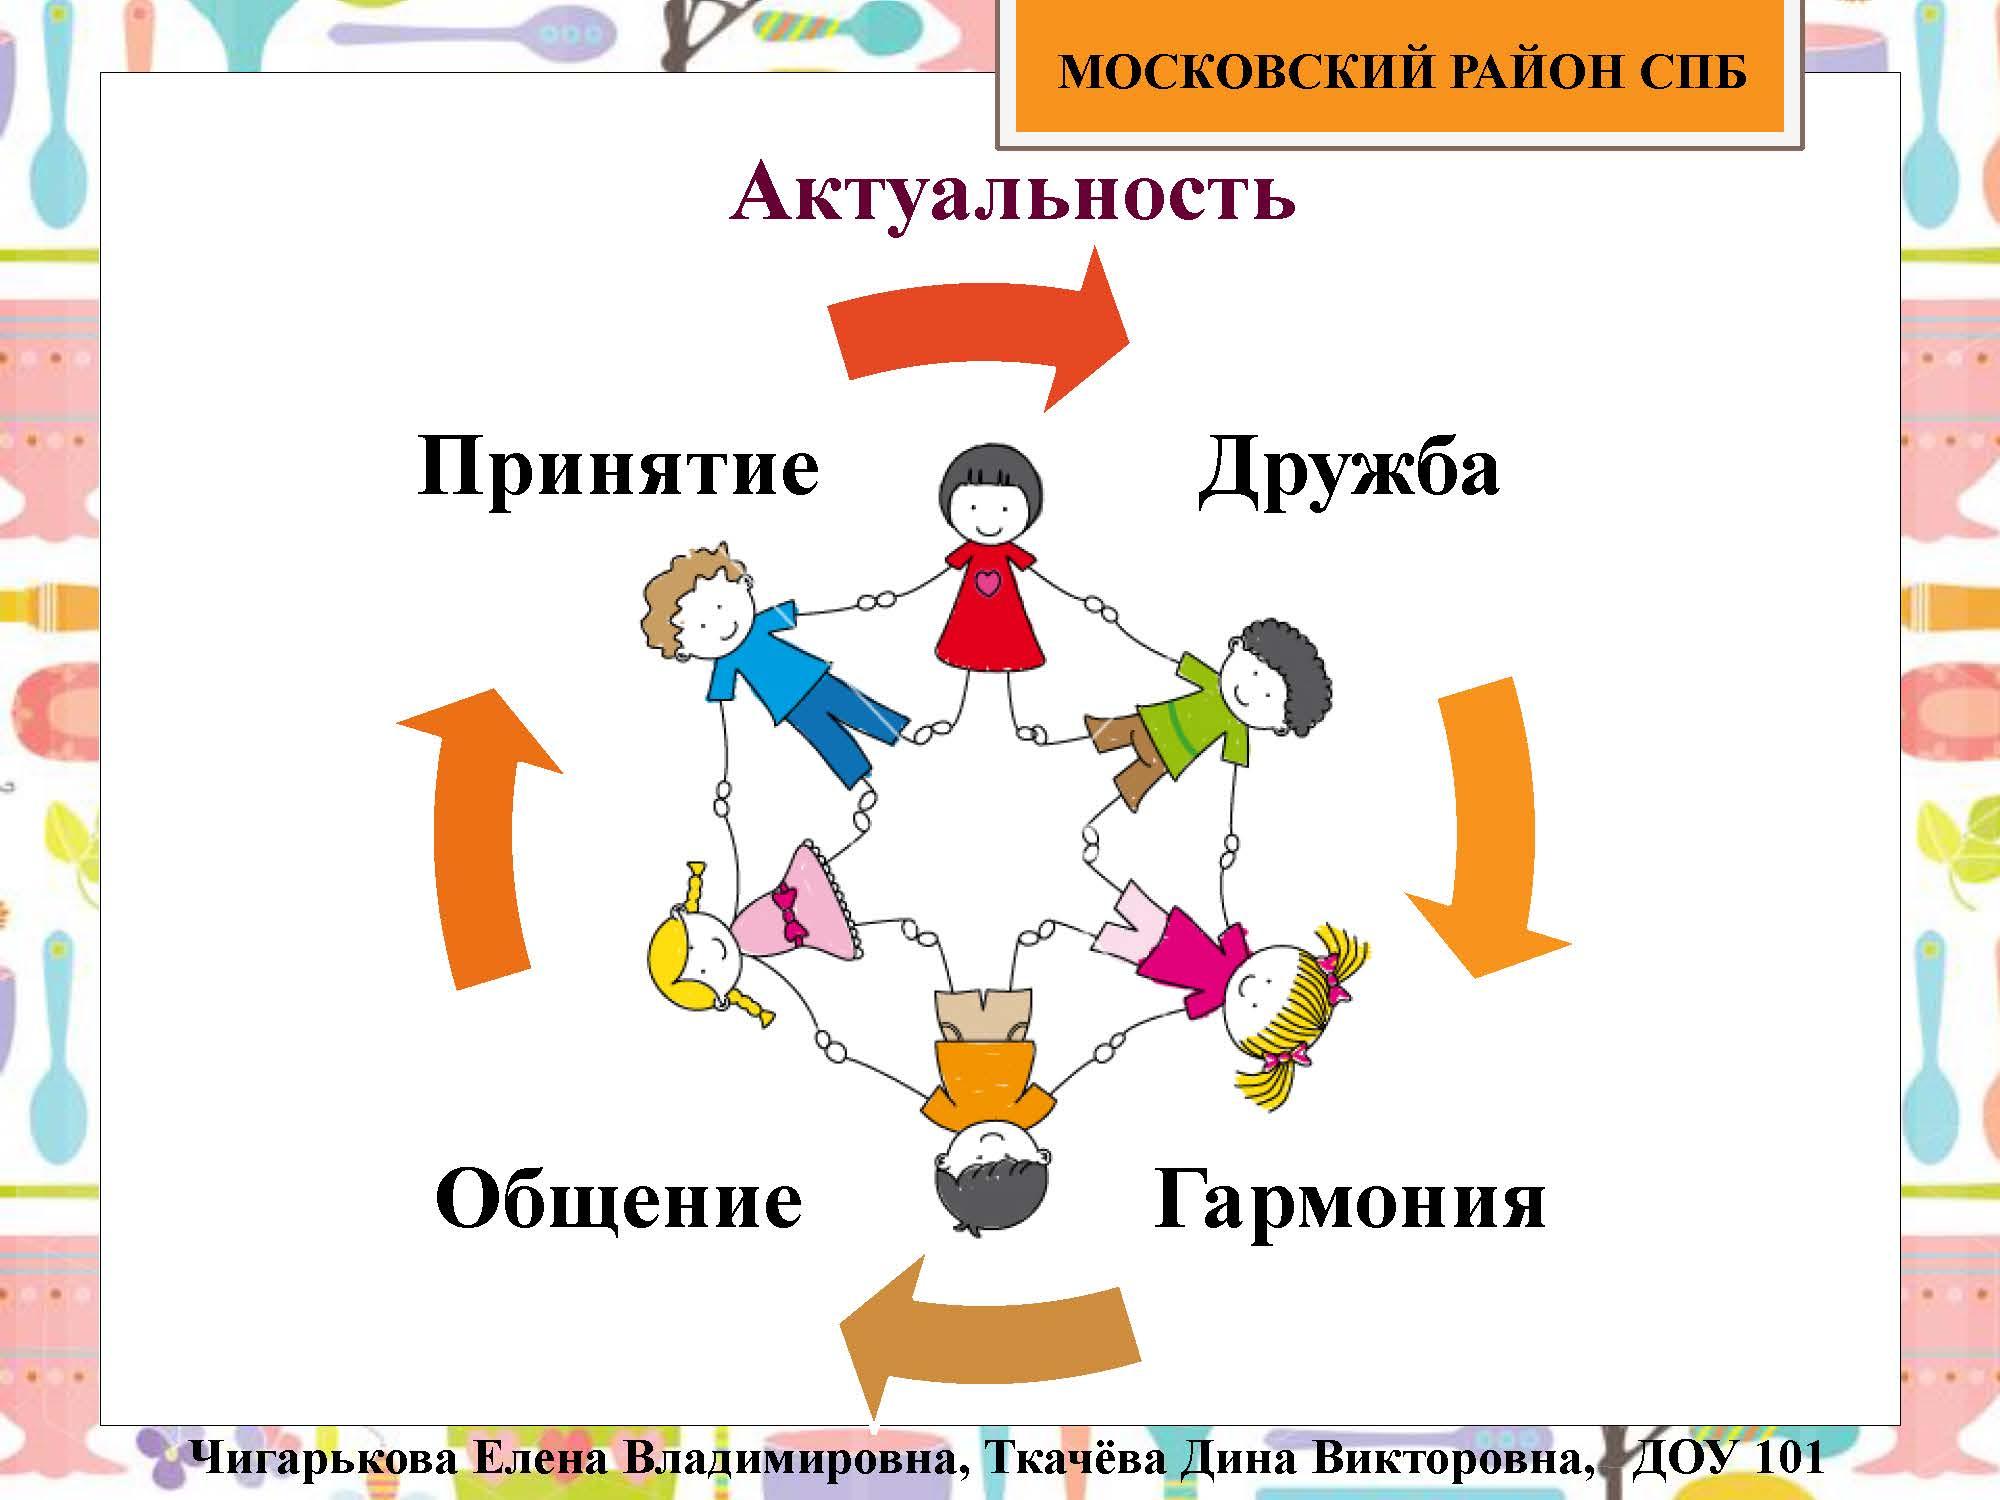 Секция 8. ДОУ 101, ПСИ. Московский район_Страница_02